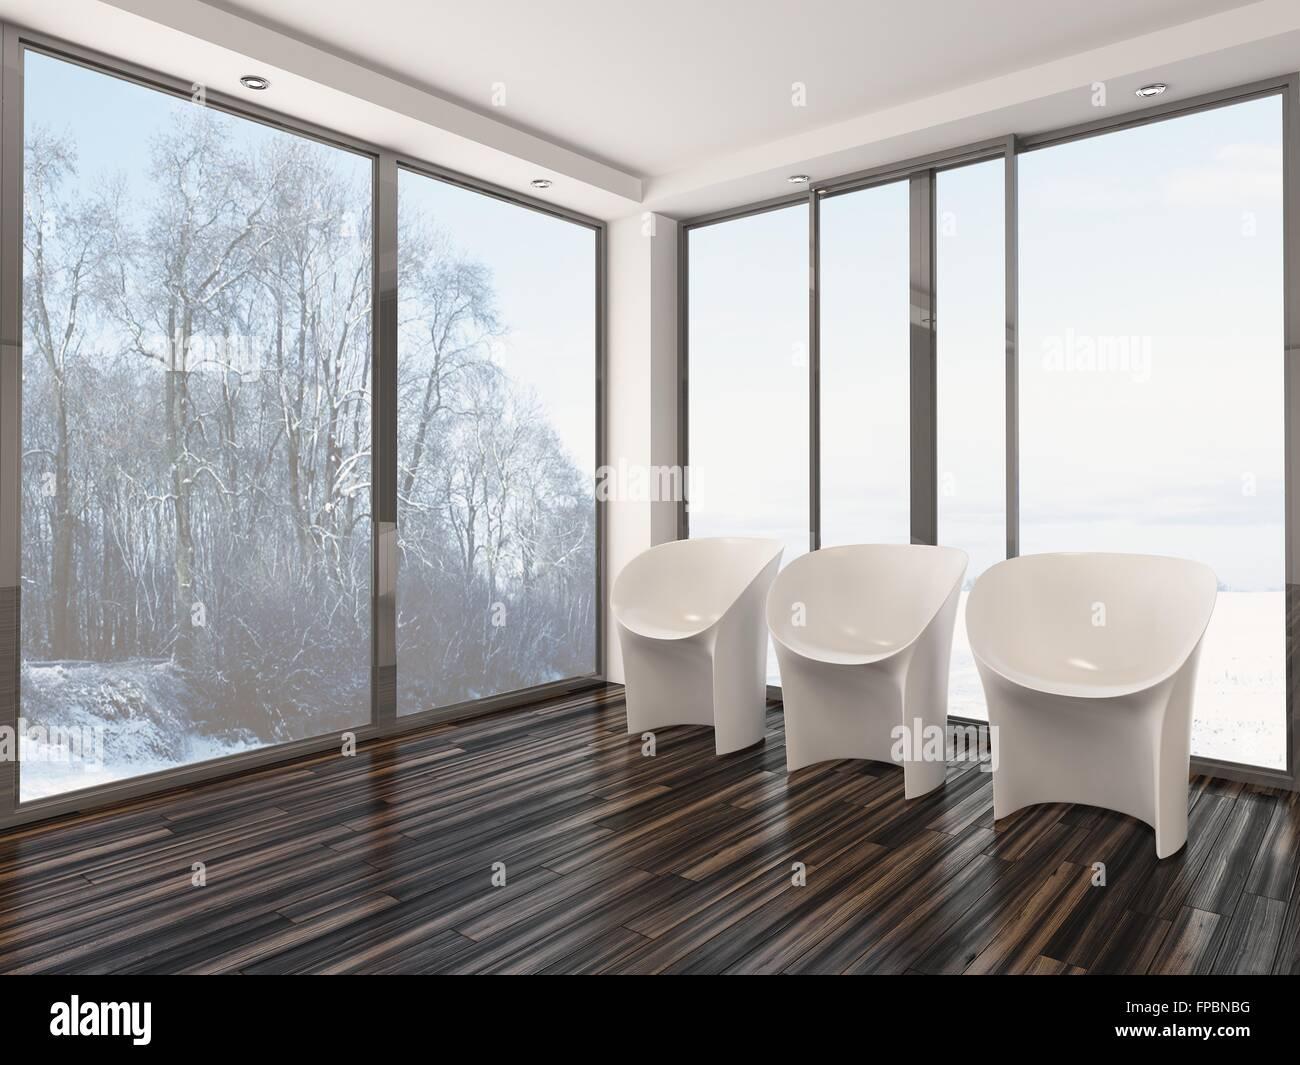 Tre modulari moderne sedie bianche in piedi in fila su di un legno